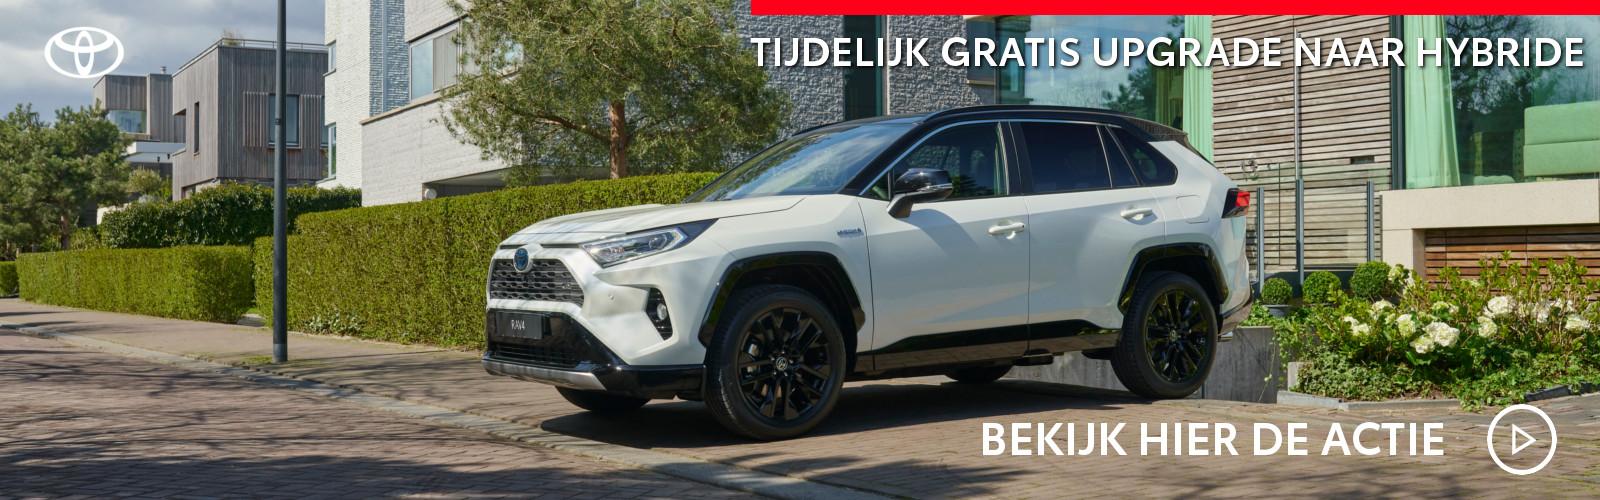 mengelers-automotive-toyota-hybride-upgrade